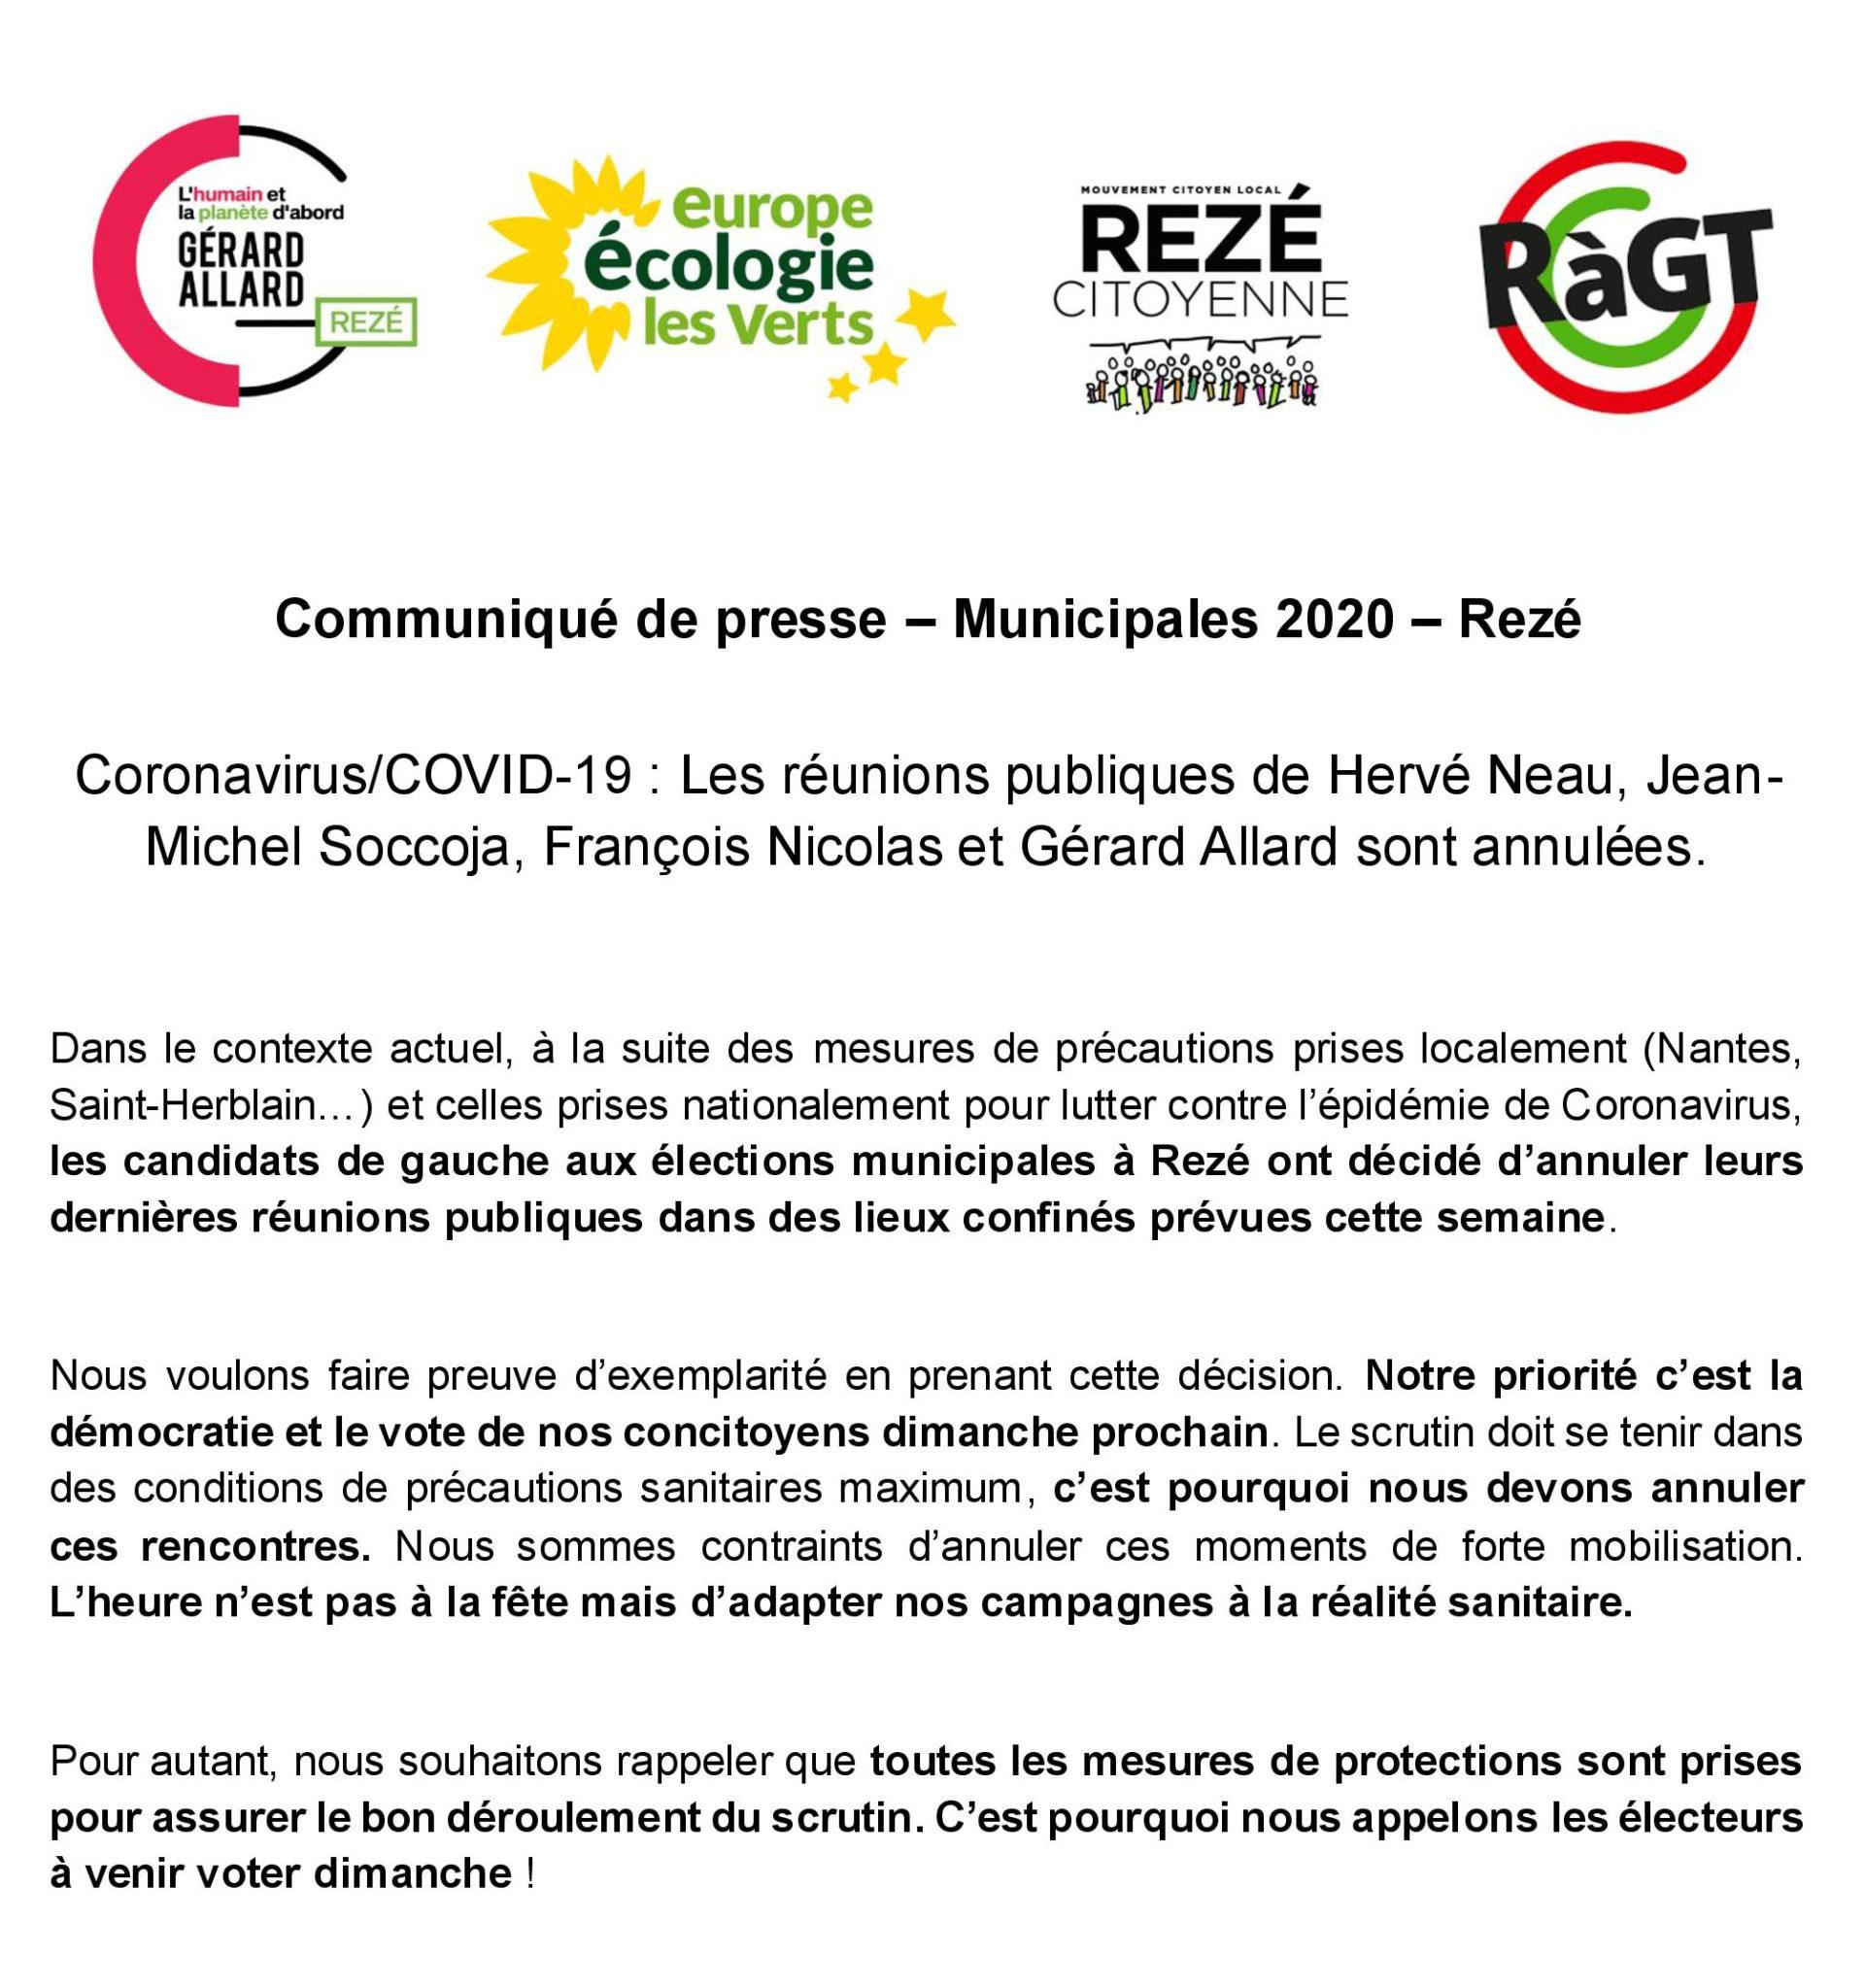 Réunion 12 mars Rezé Citoyenne